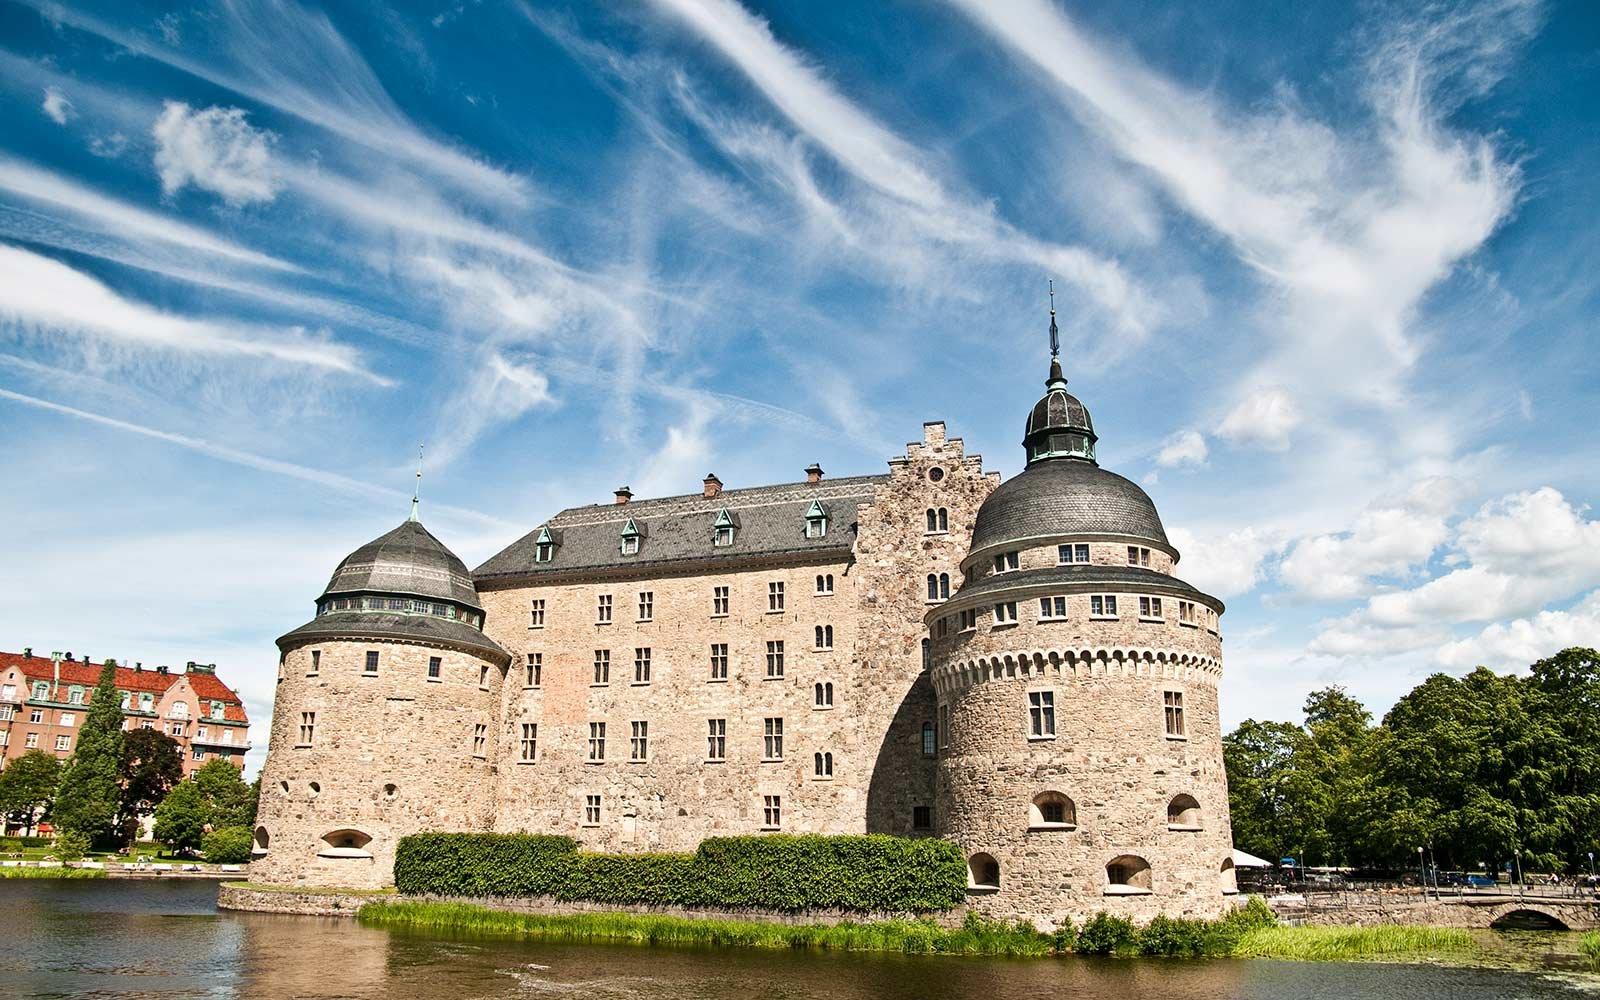 orebro-castle-sweden-CASTLES0417.jpg